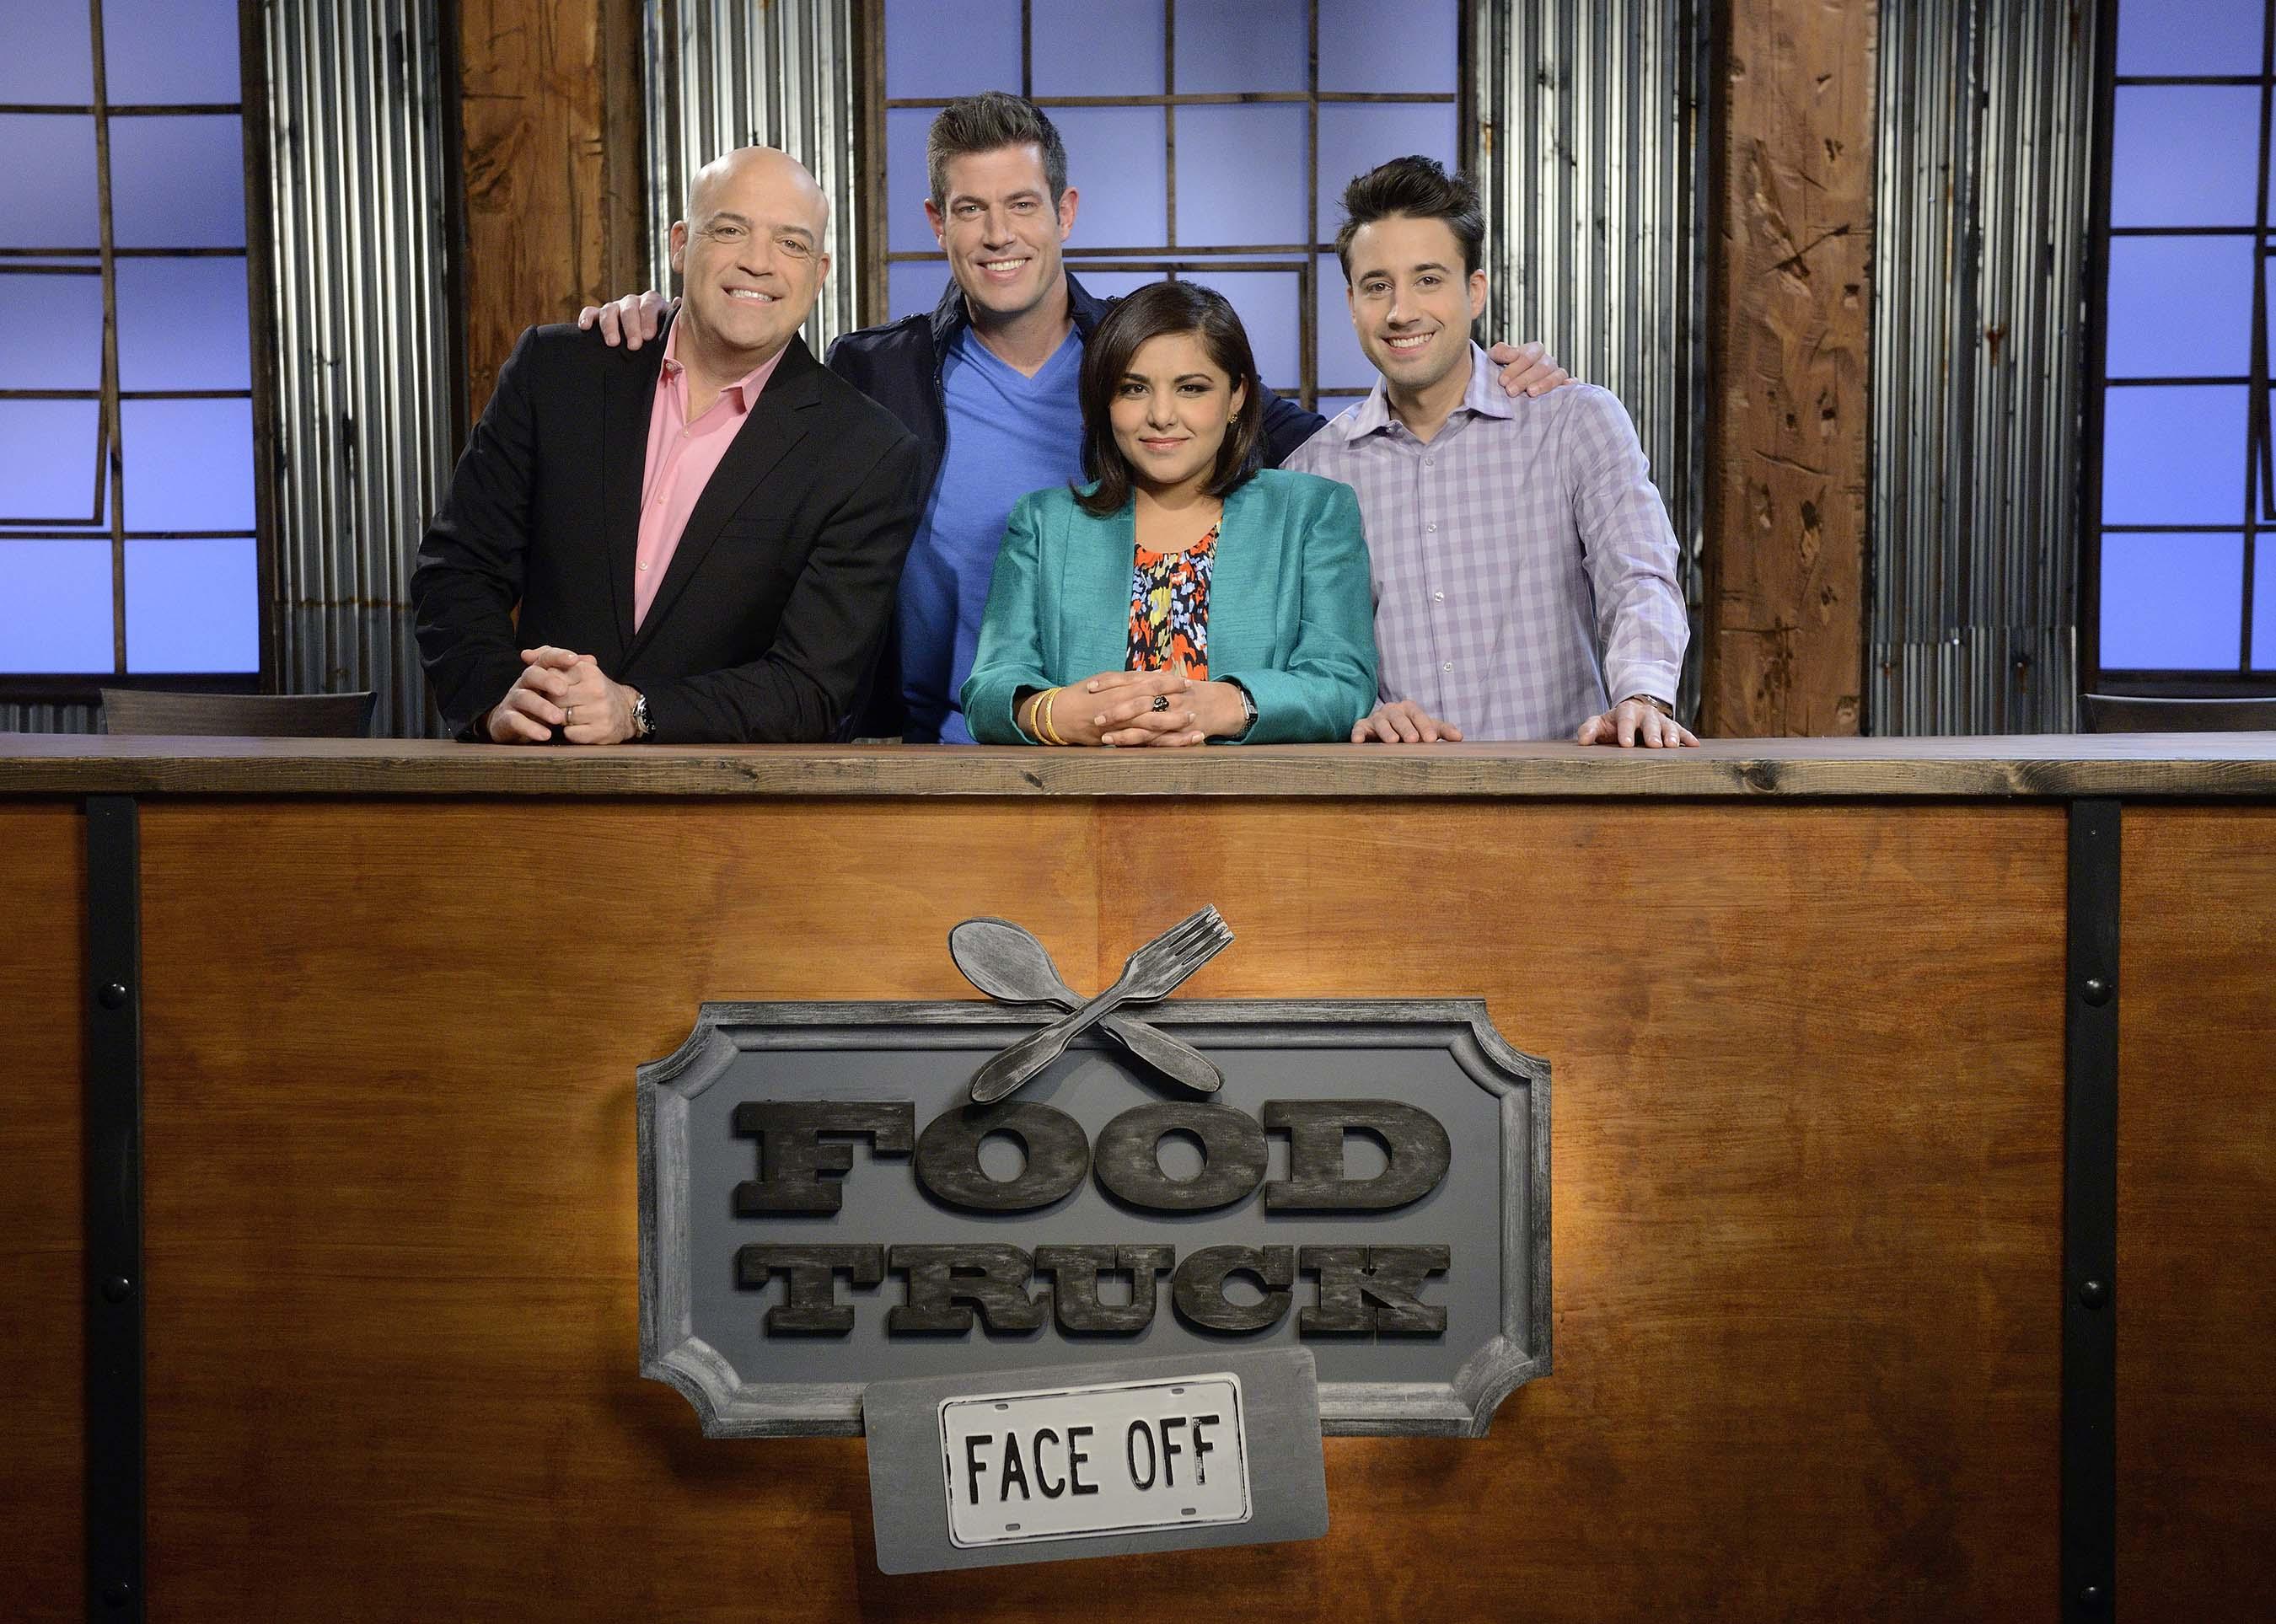 food-truck-face-off-judges